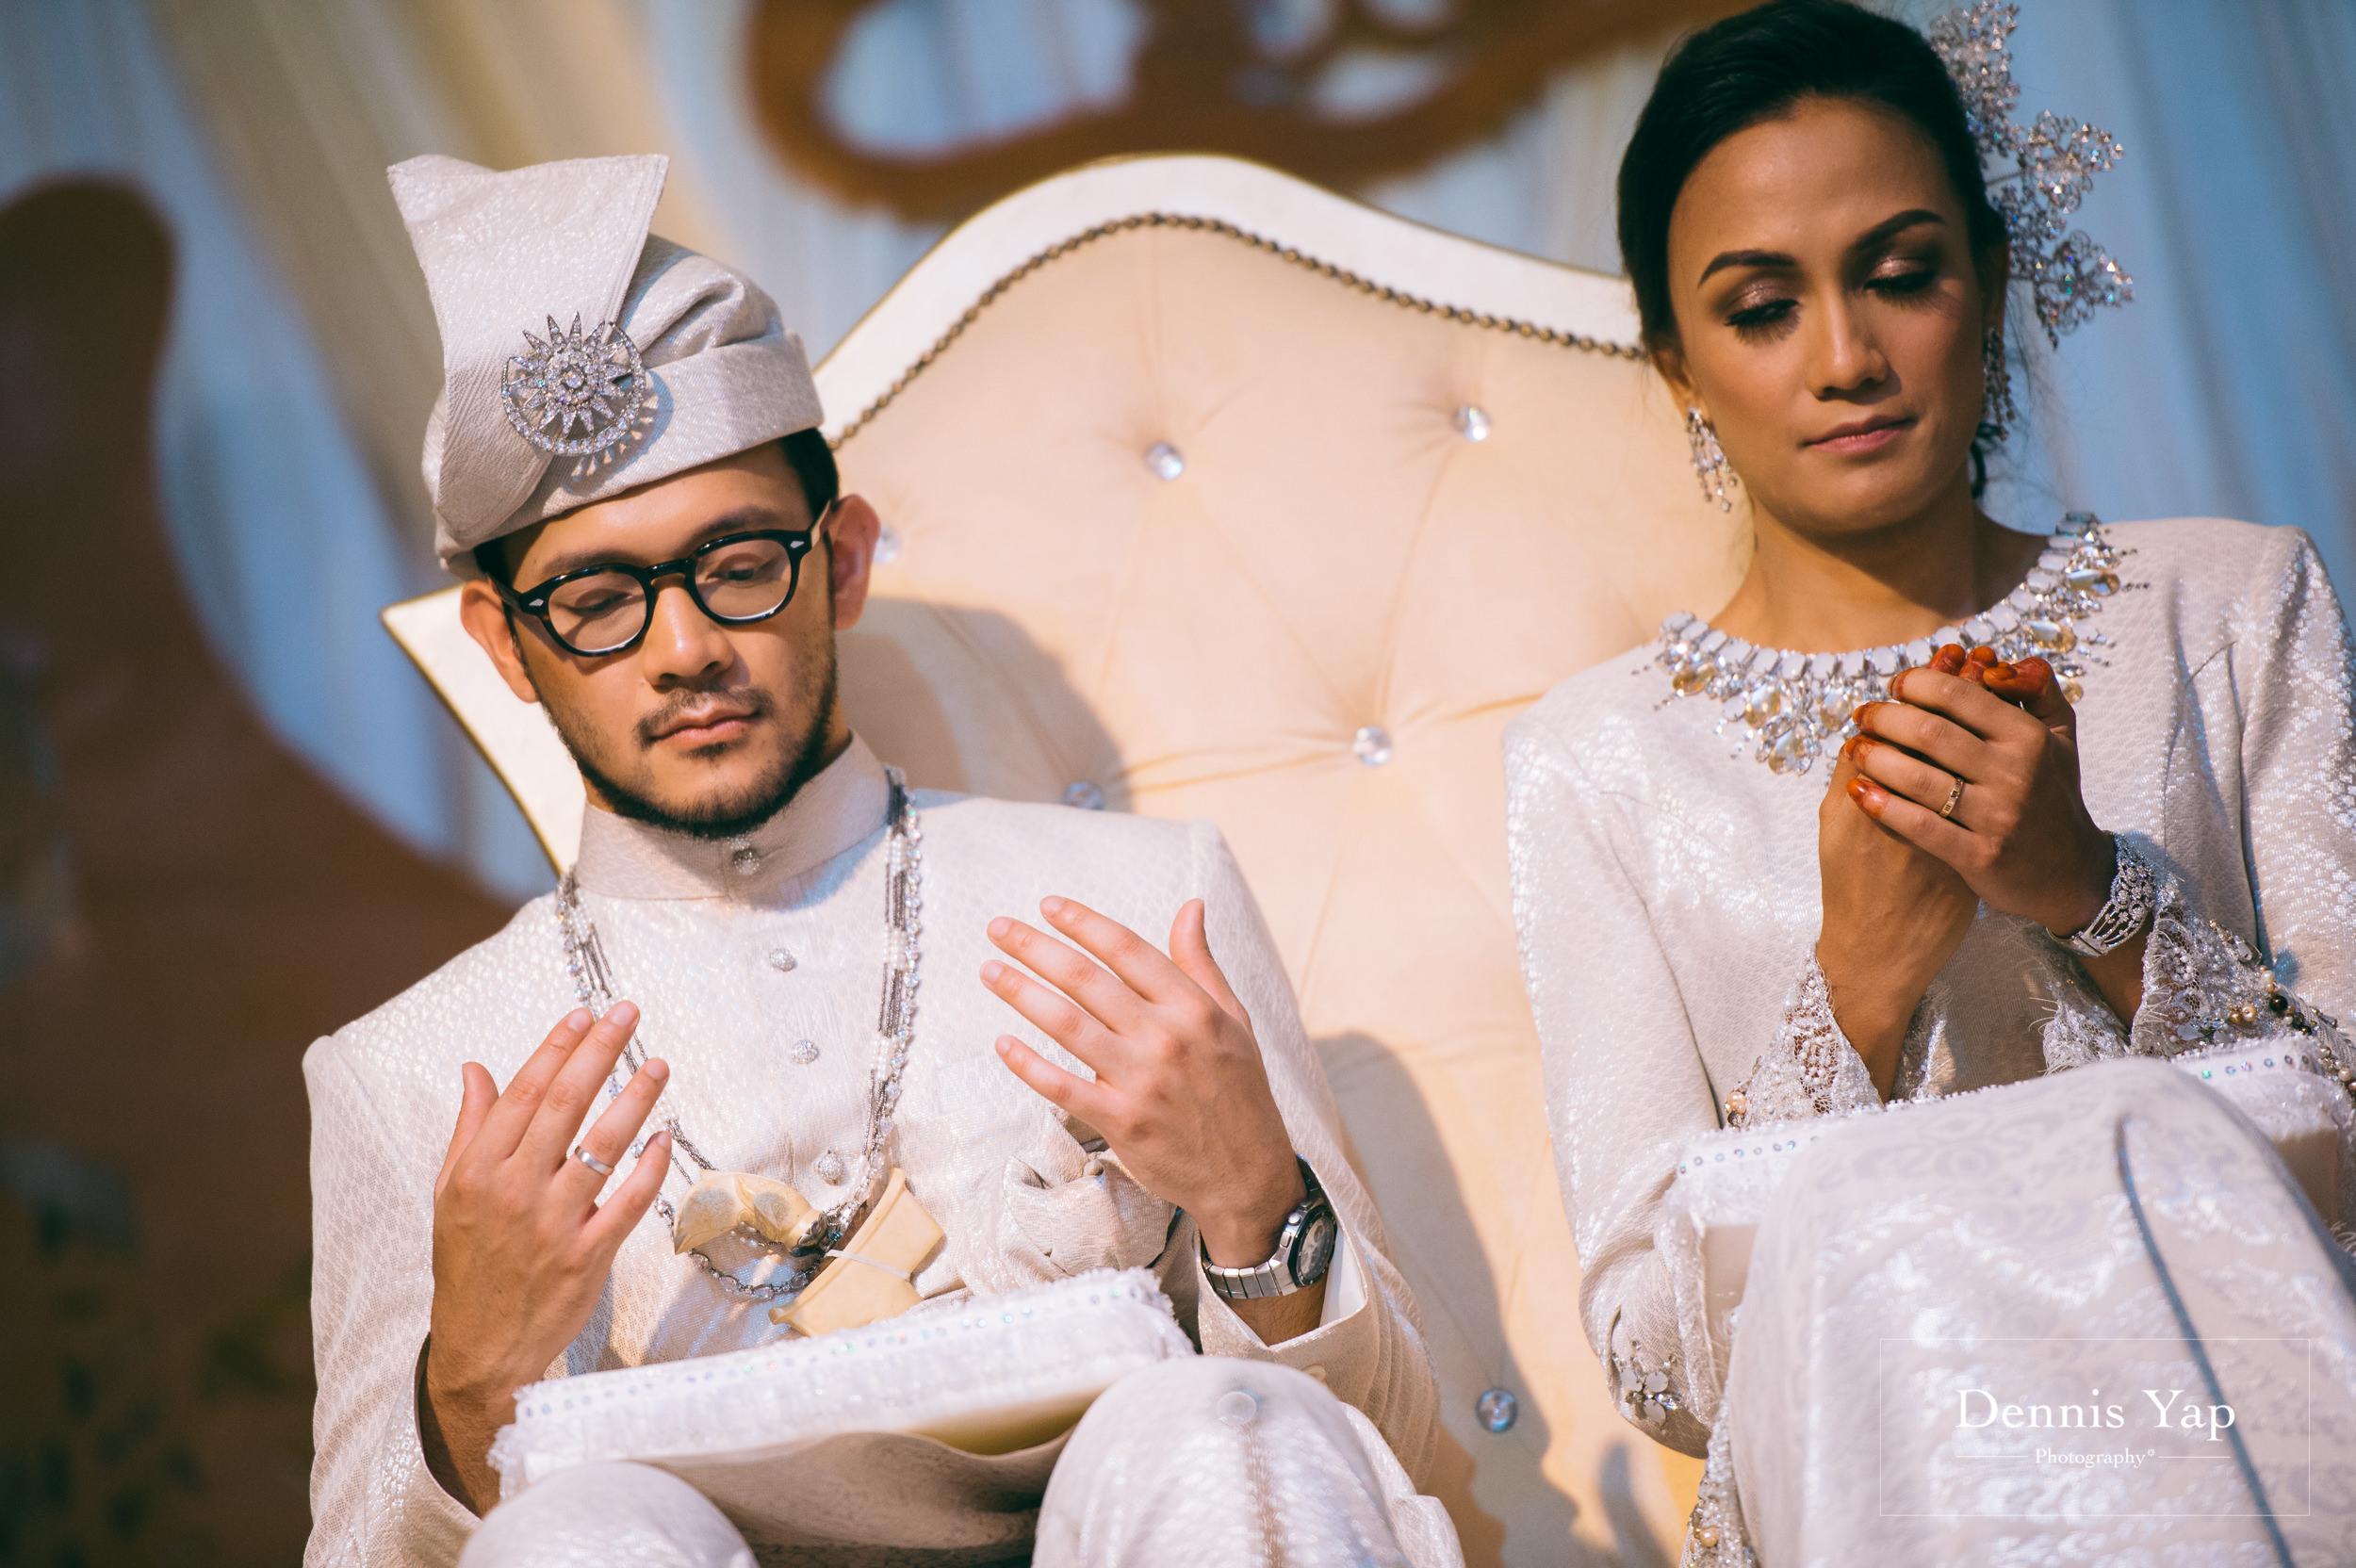 zarif hanalili malay wedding blessing ceremony dennis yap photography-16.jpg